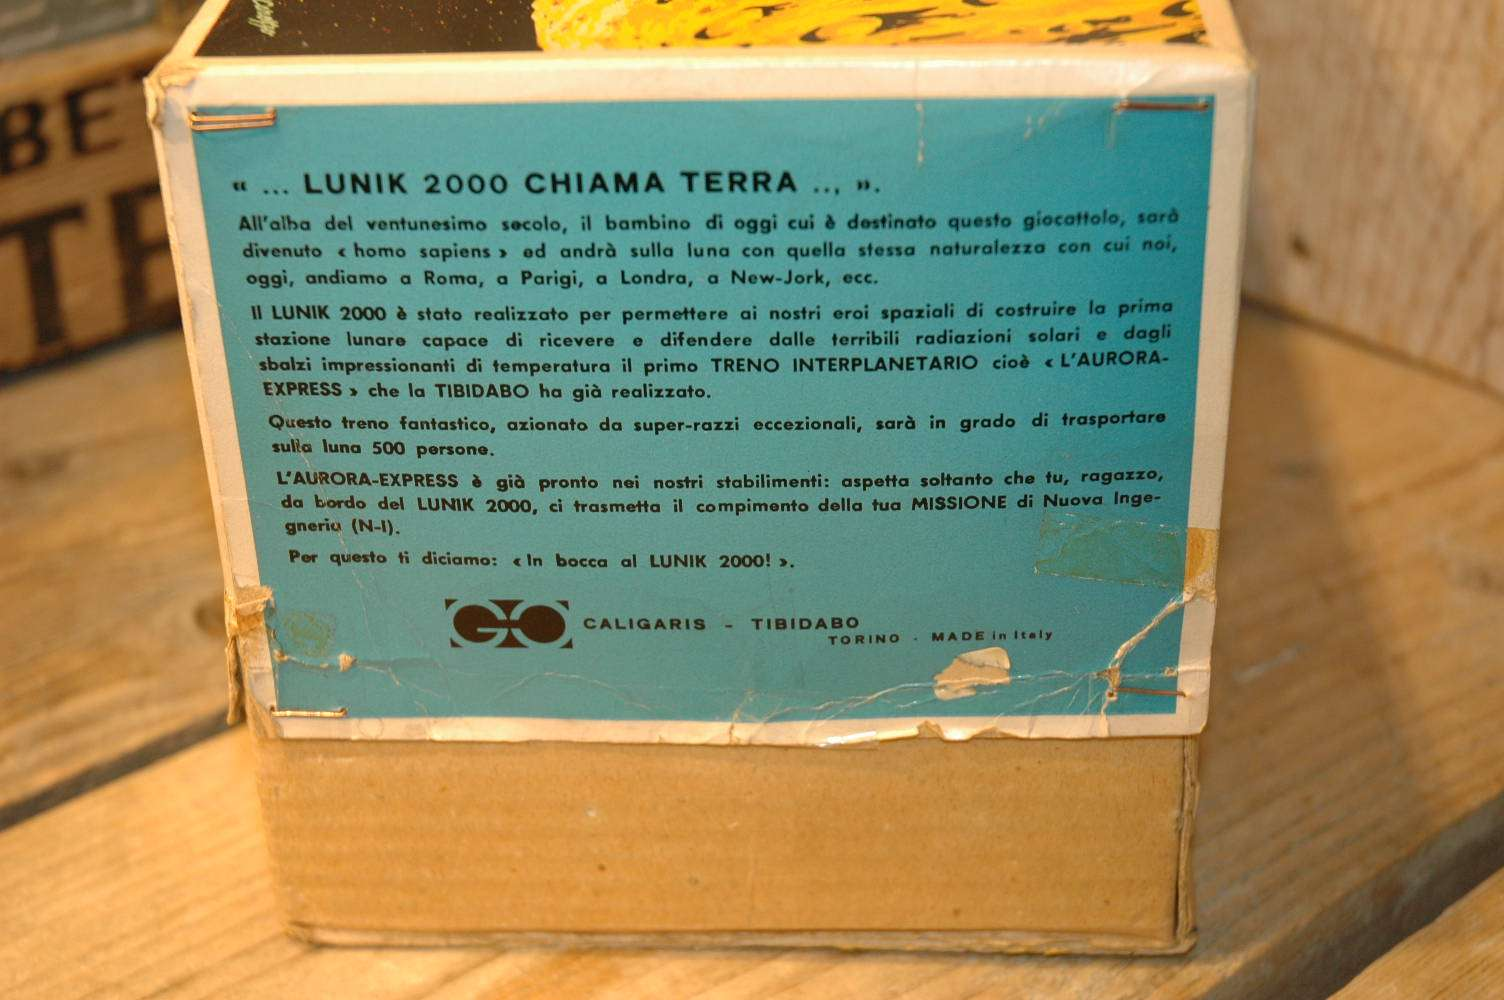 Tibidabo - Lunik 2000